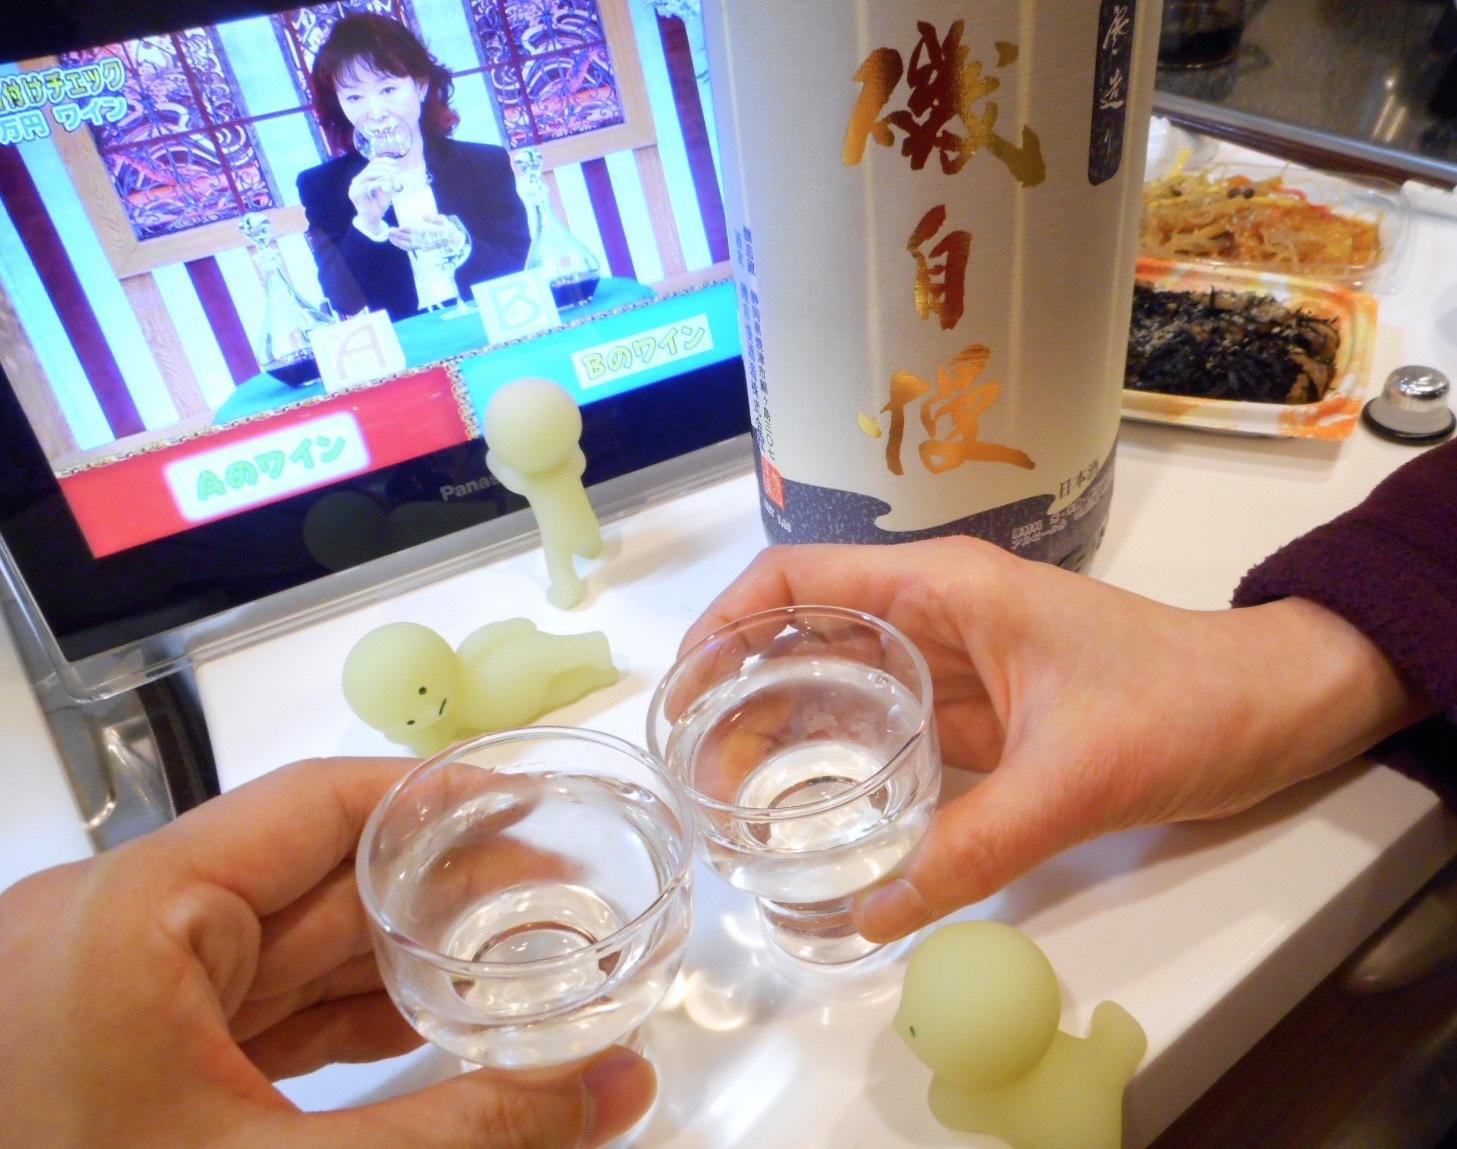 isojiman_shiboritate_honjozou28by5.jpg